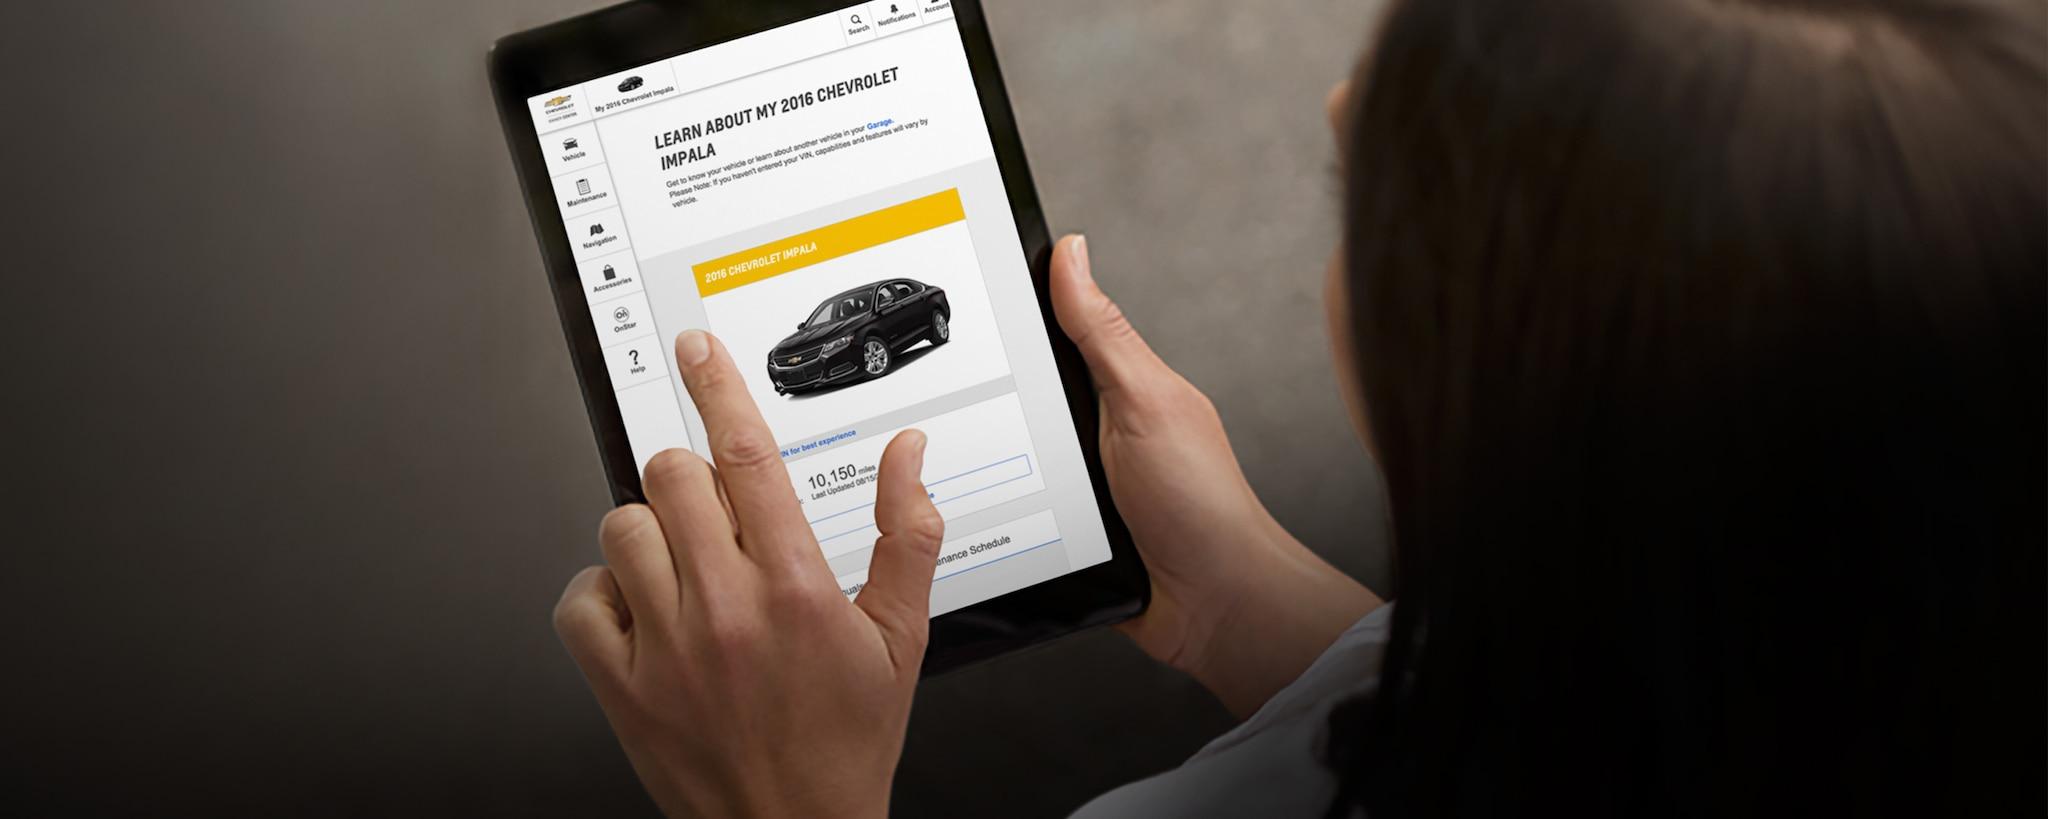 Recursos para propietarios Chevy: Centro de dueños